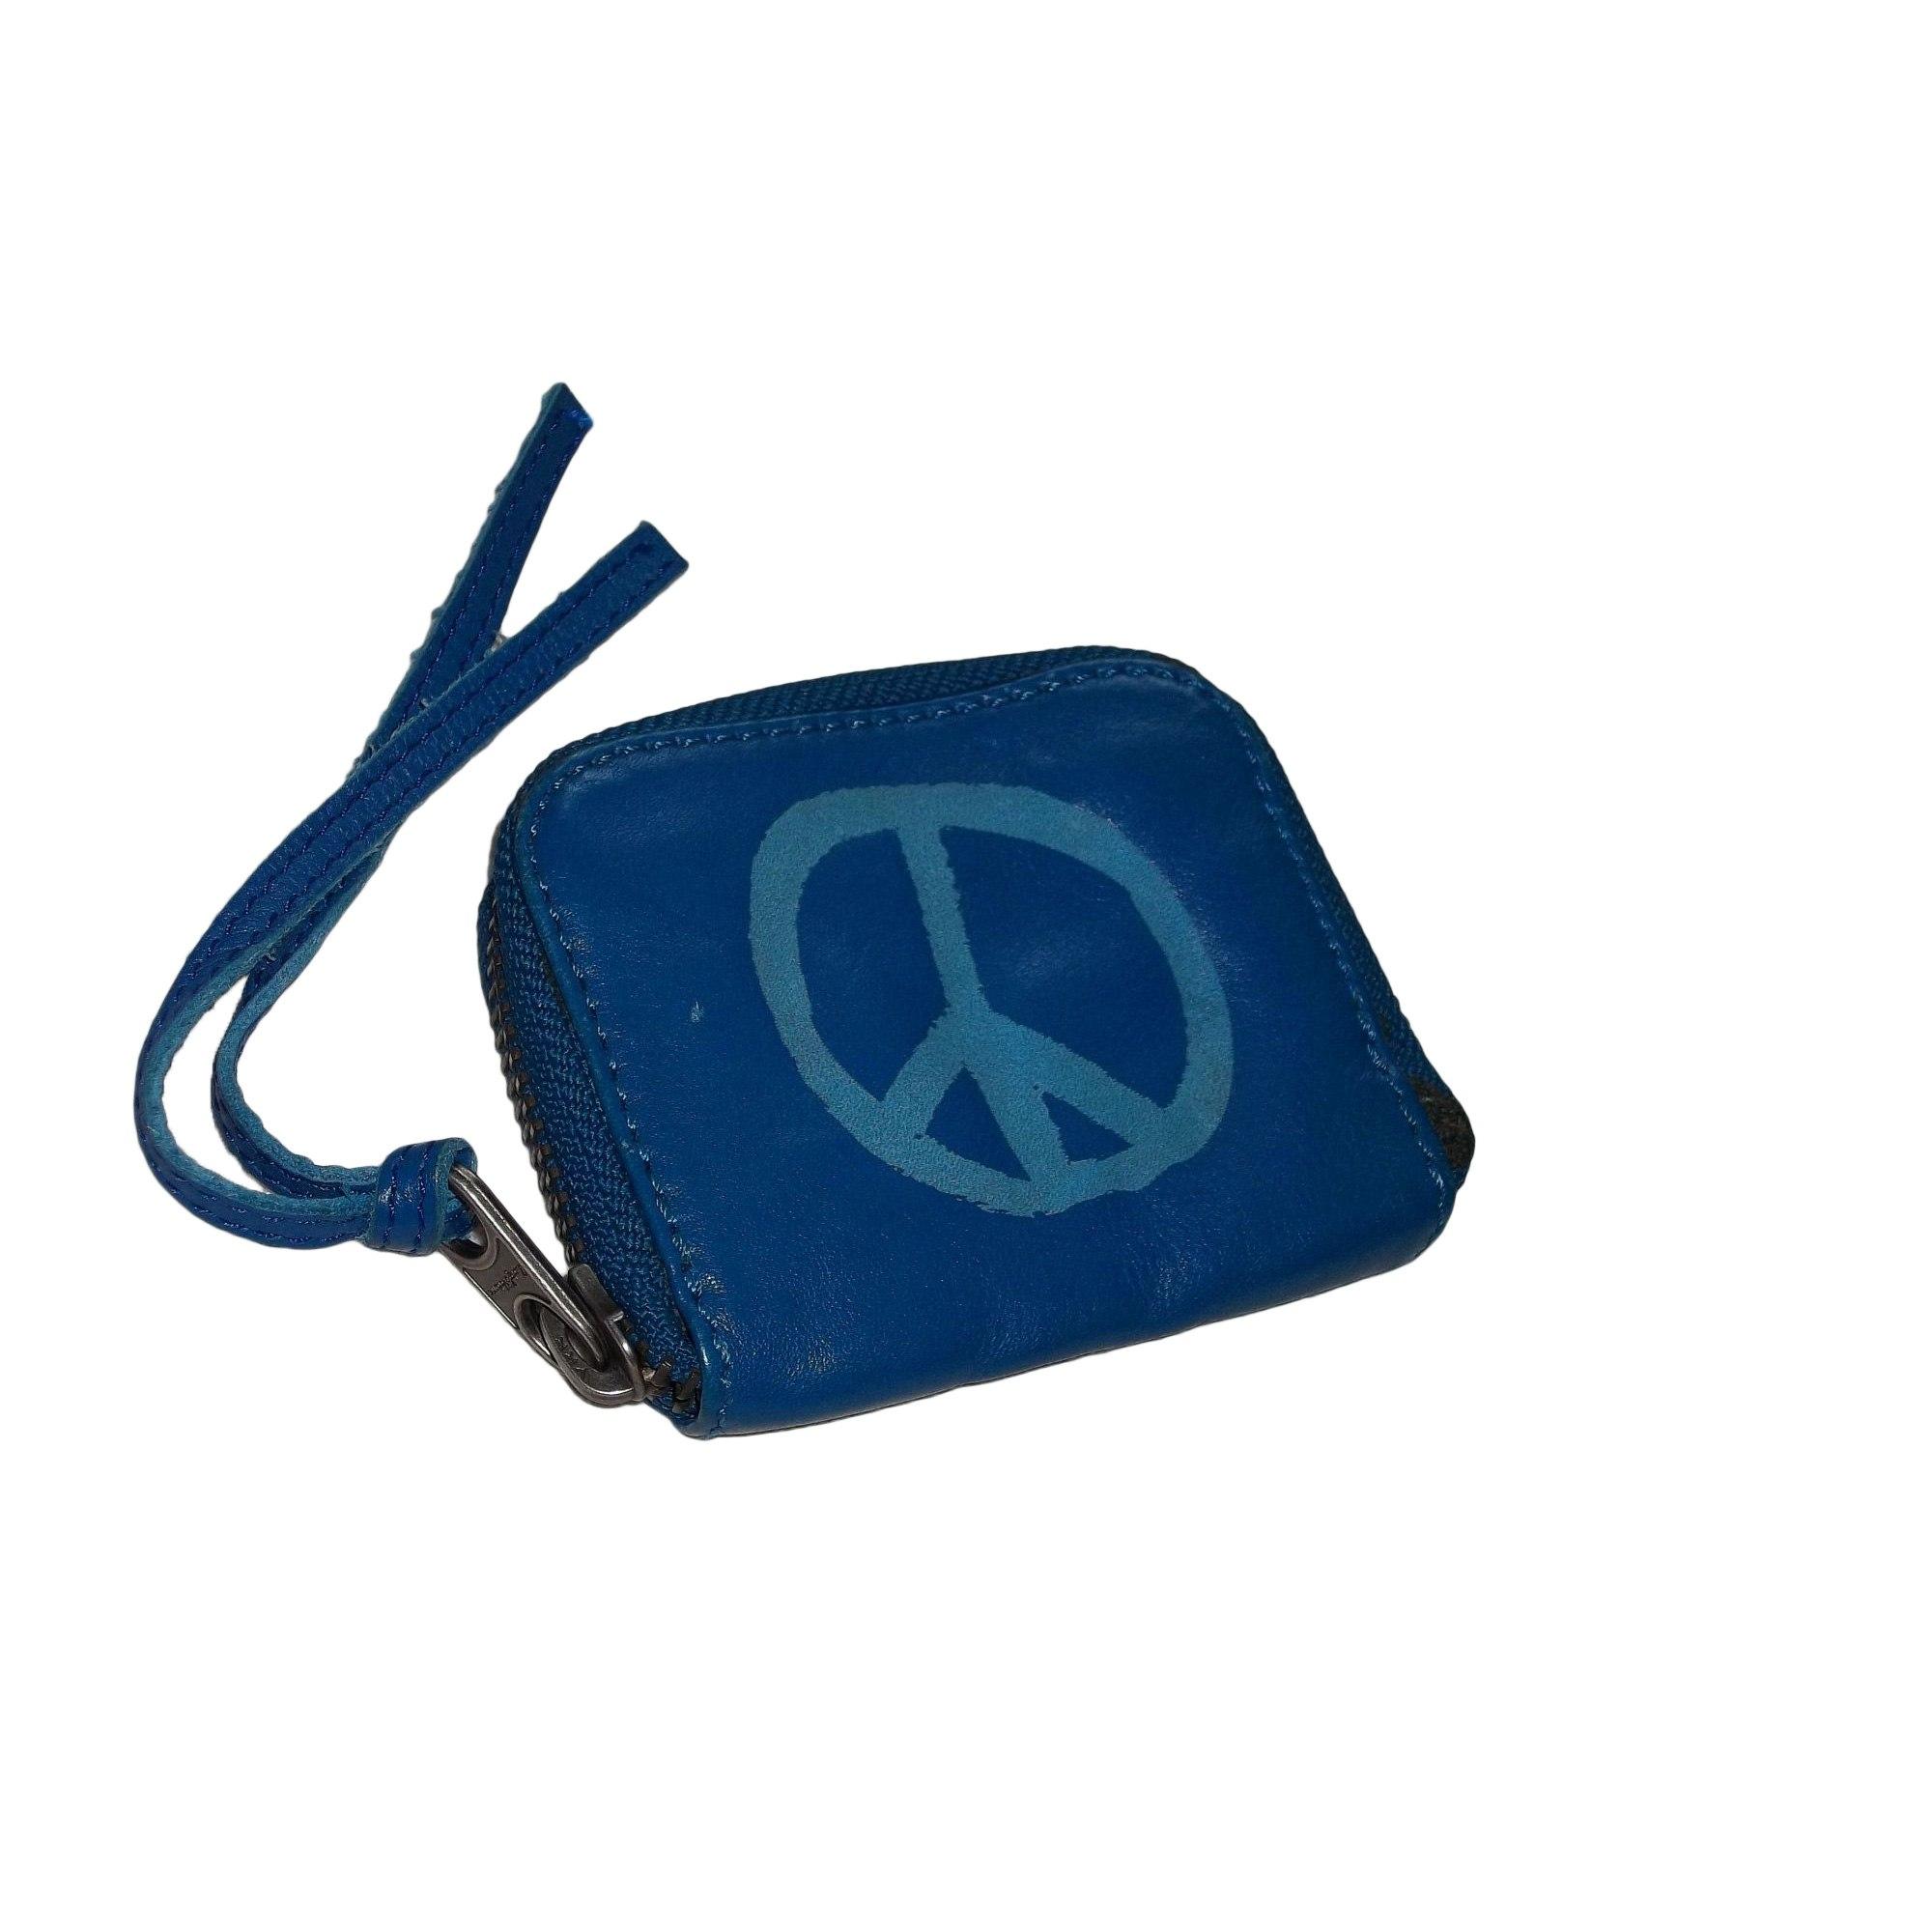 Porte-monnaie ZADIG & VOLTAIRE Bleu, bleu marine, bleu turquoise